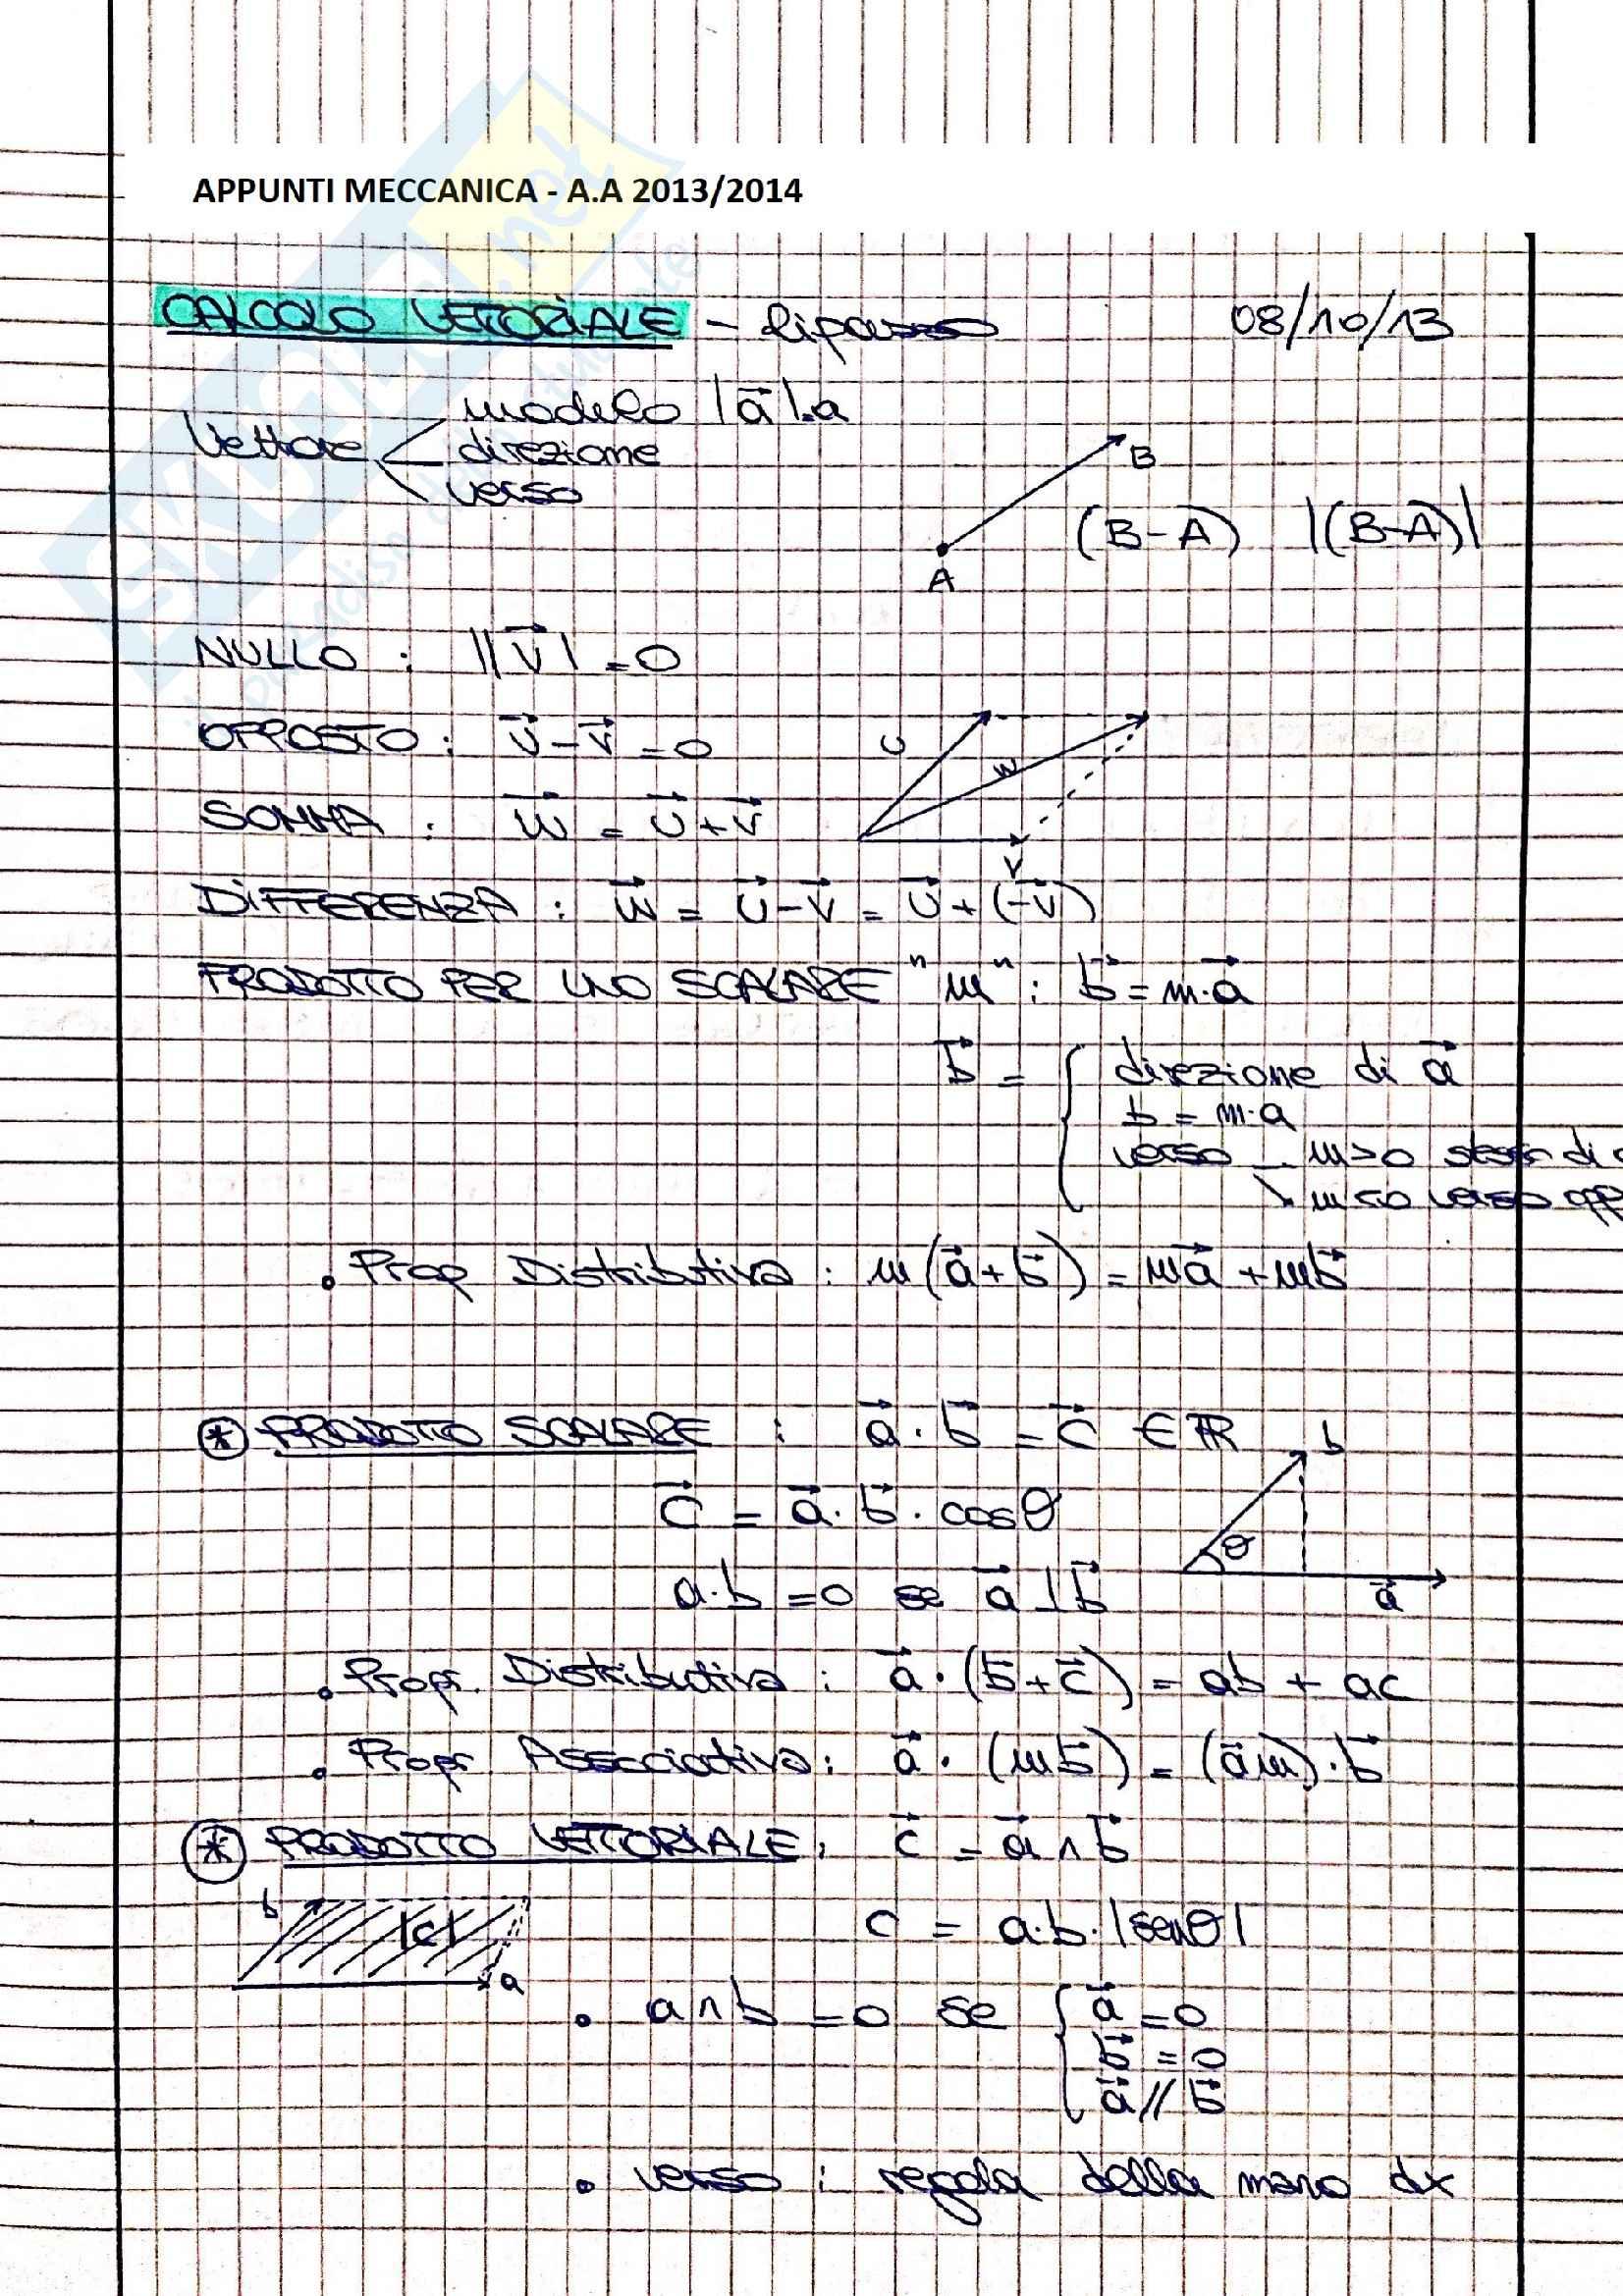 Meccanica - Appunti completi ed esercitazioni